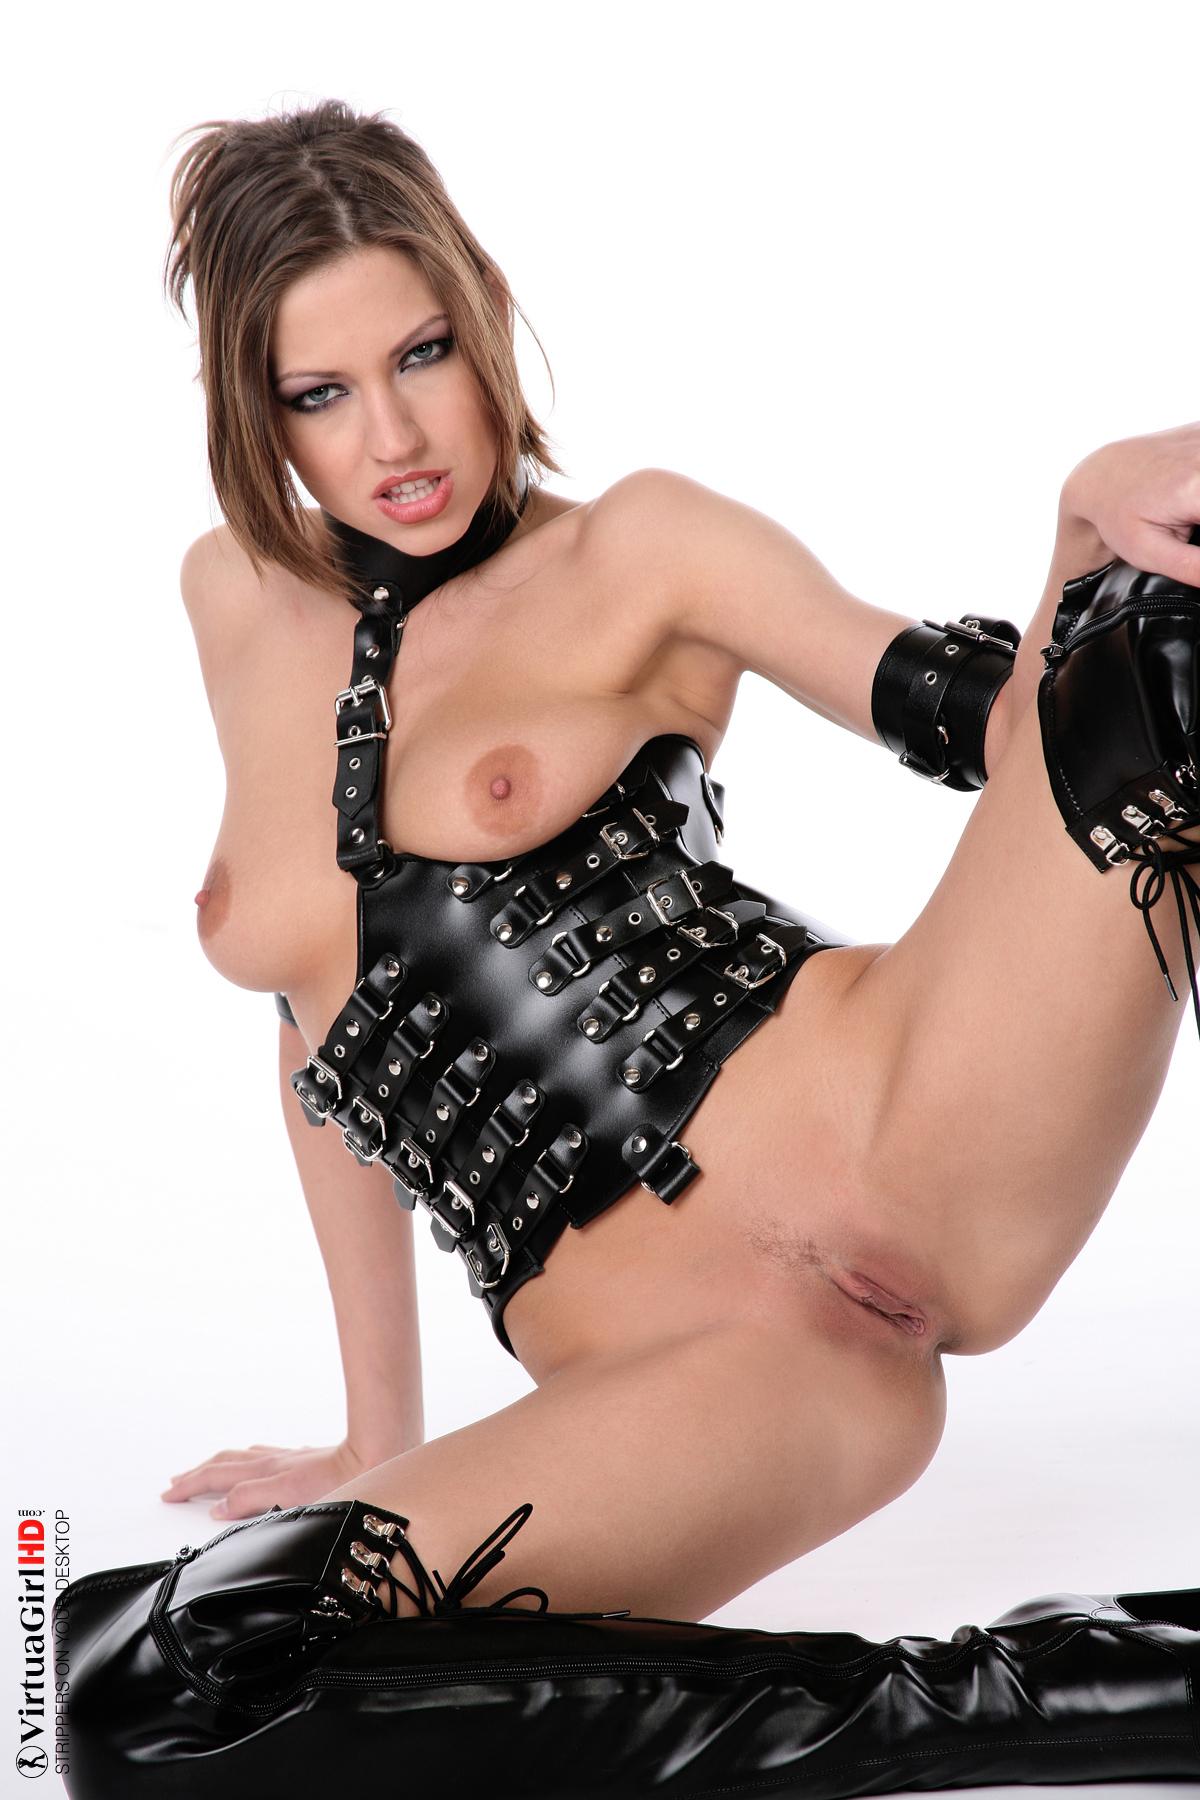 hot girls stripping down